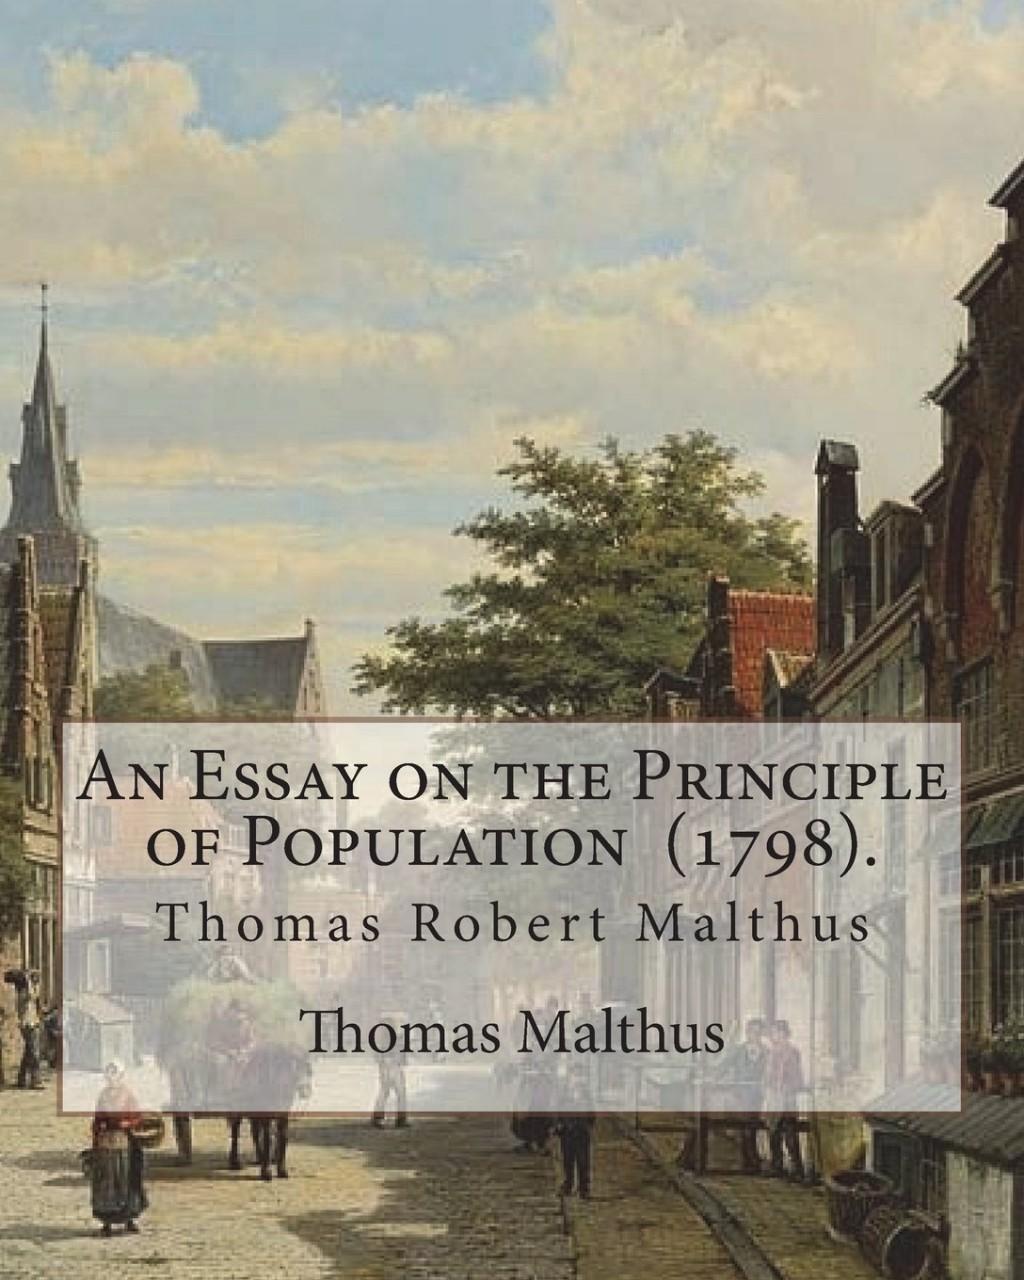 018 Essay On The Principle Of Population 71giypnbhsl Singular Pdf By Thomas Malthus Main Idea Large